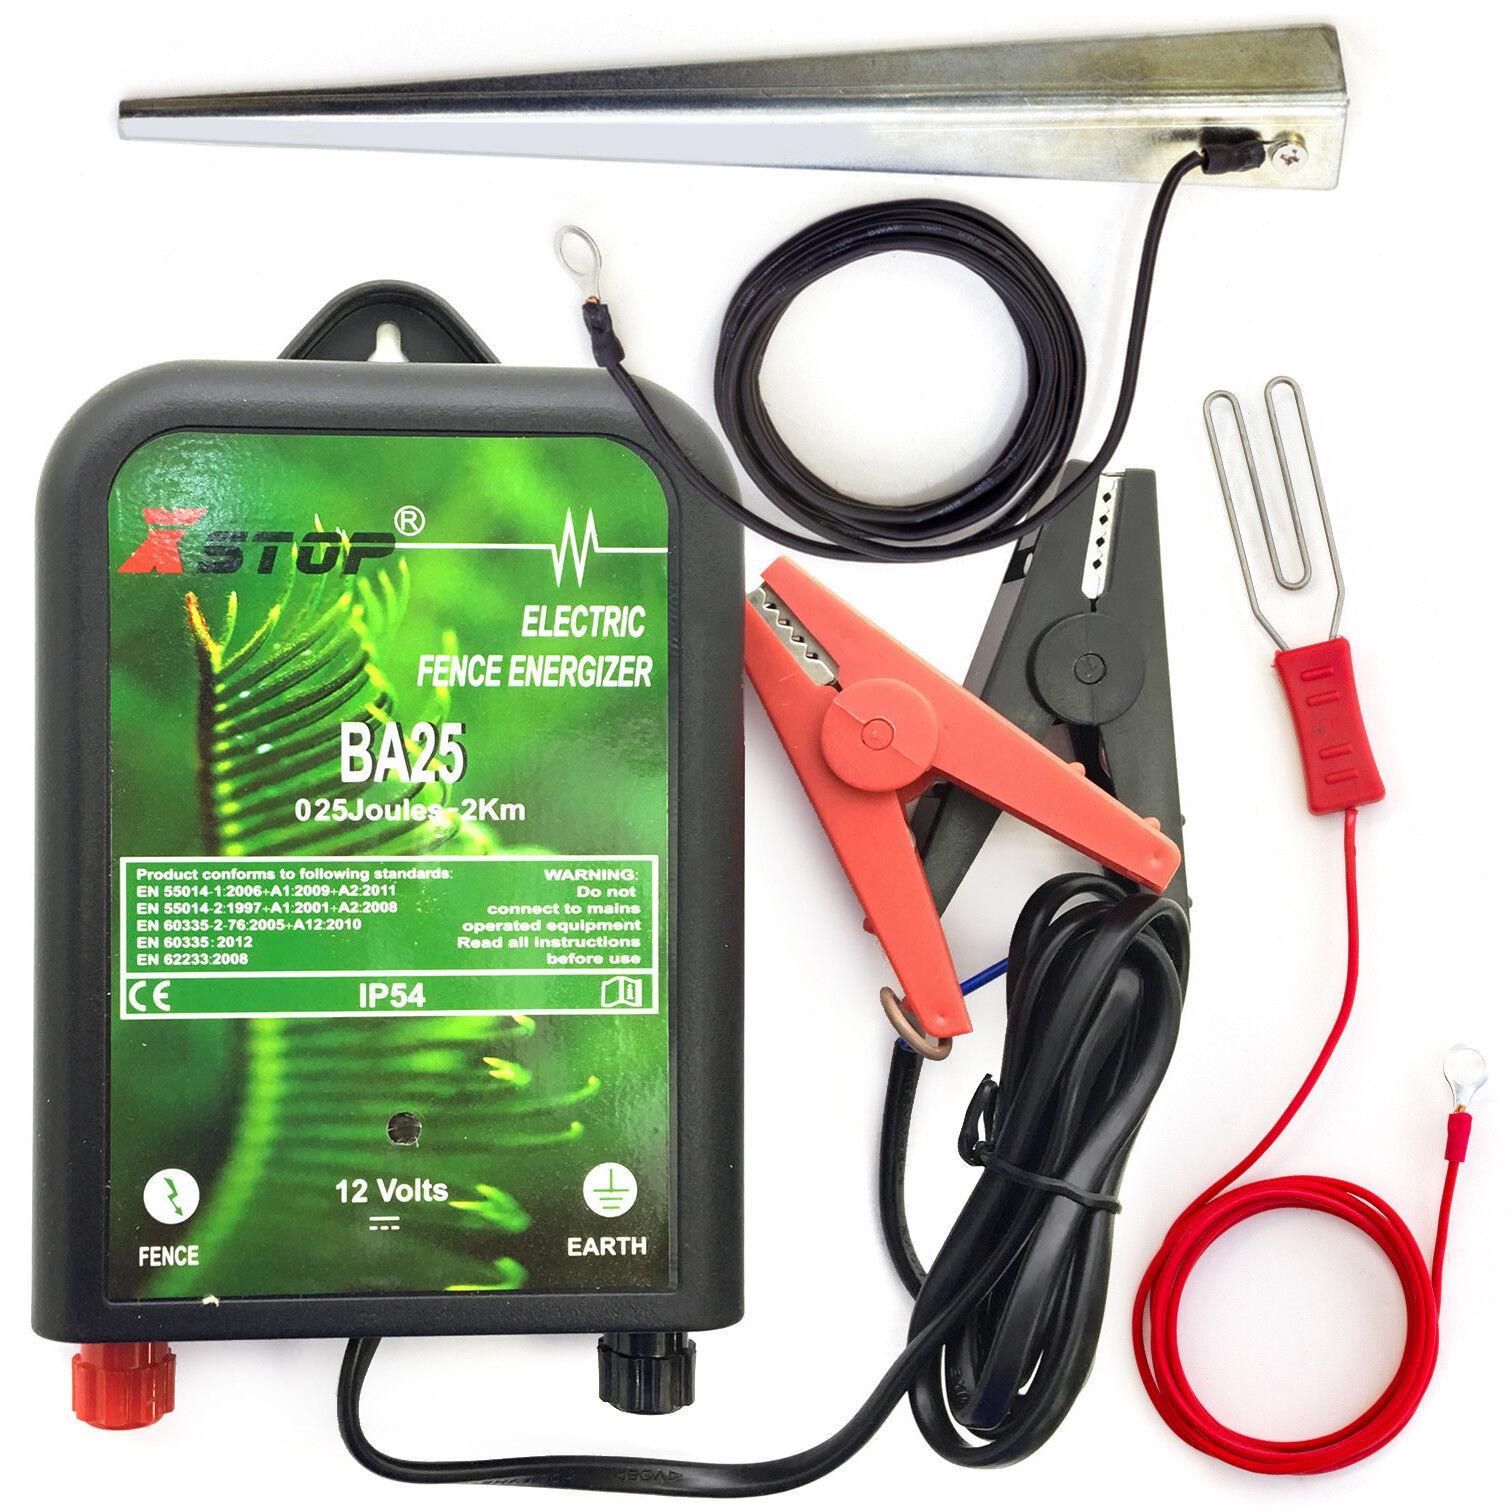 12v Batterie 2km Angetrieben Kontaktzaun Einzäunung Energiser Unit Earth .25j